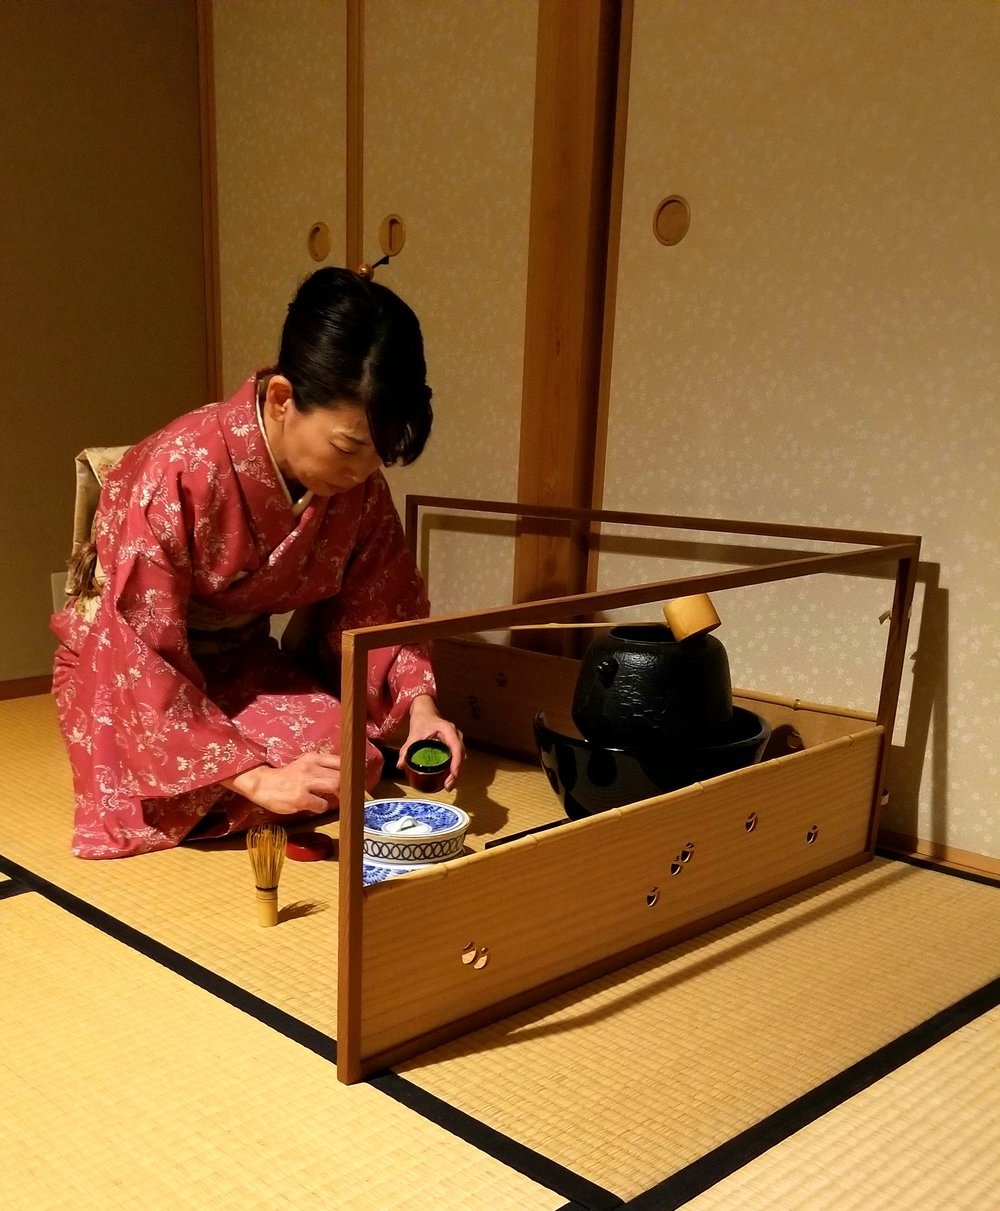 uprooted-traveler-kyoto-tea-ceremony-camellia-1.jpg